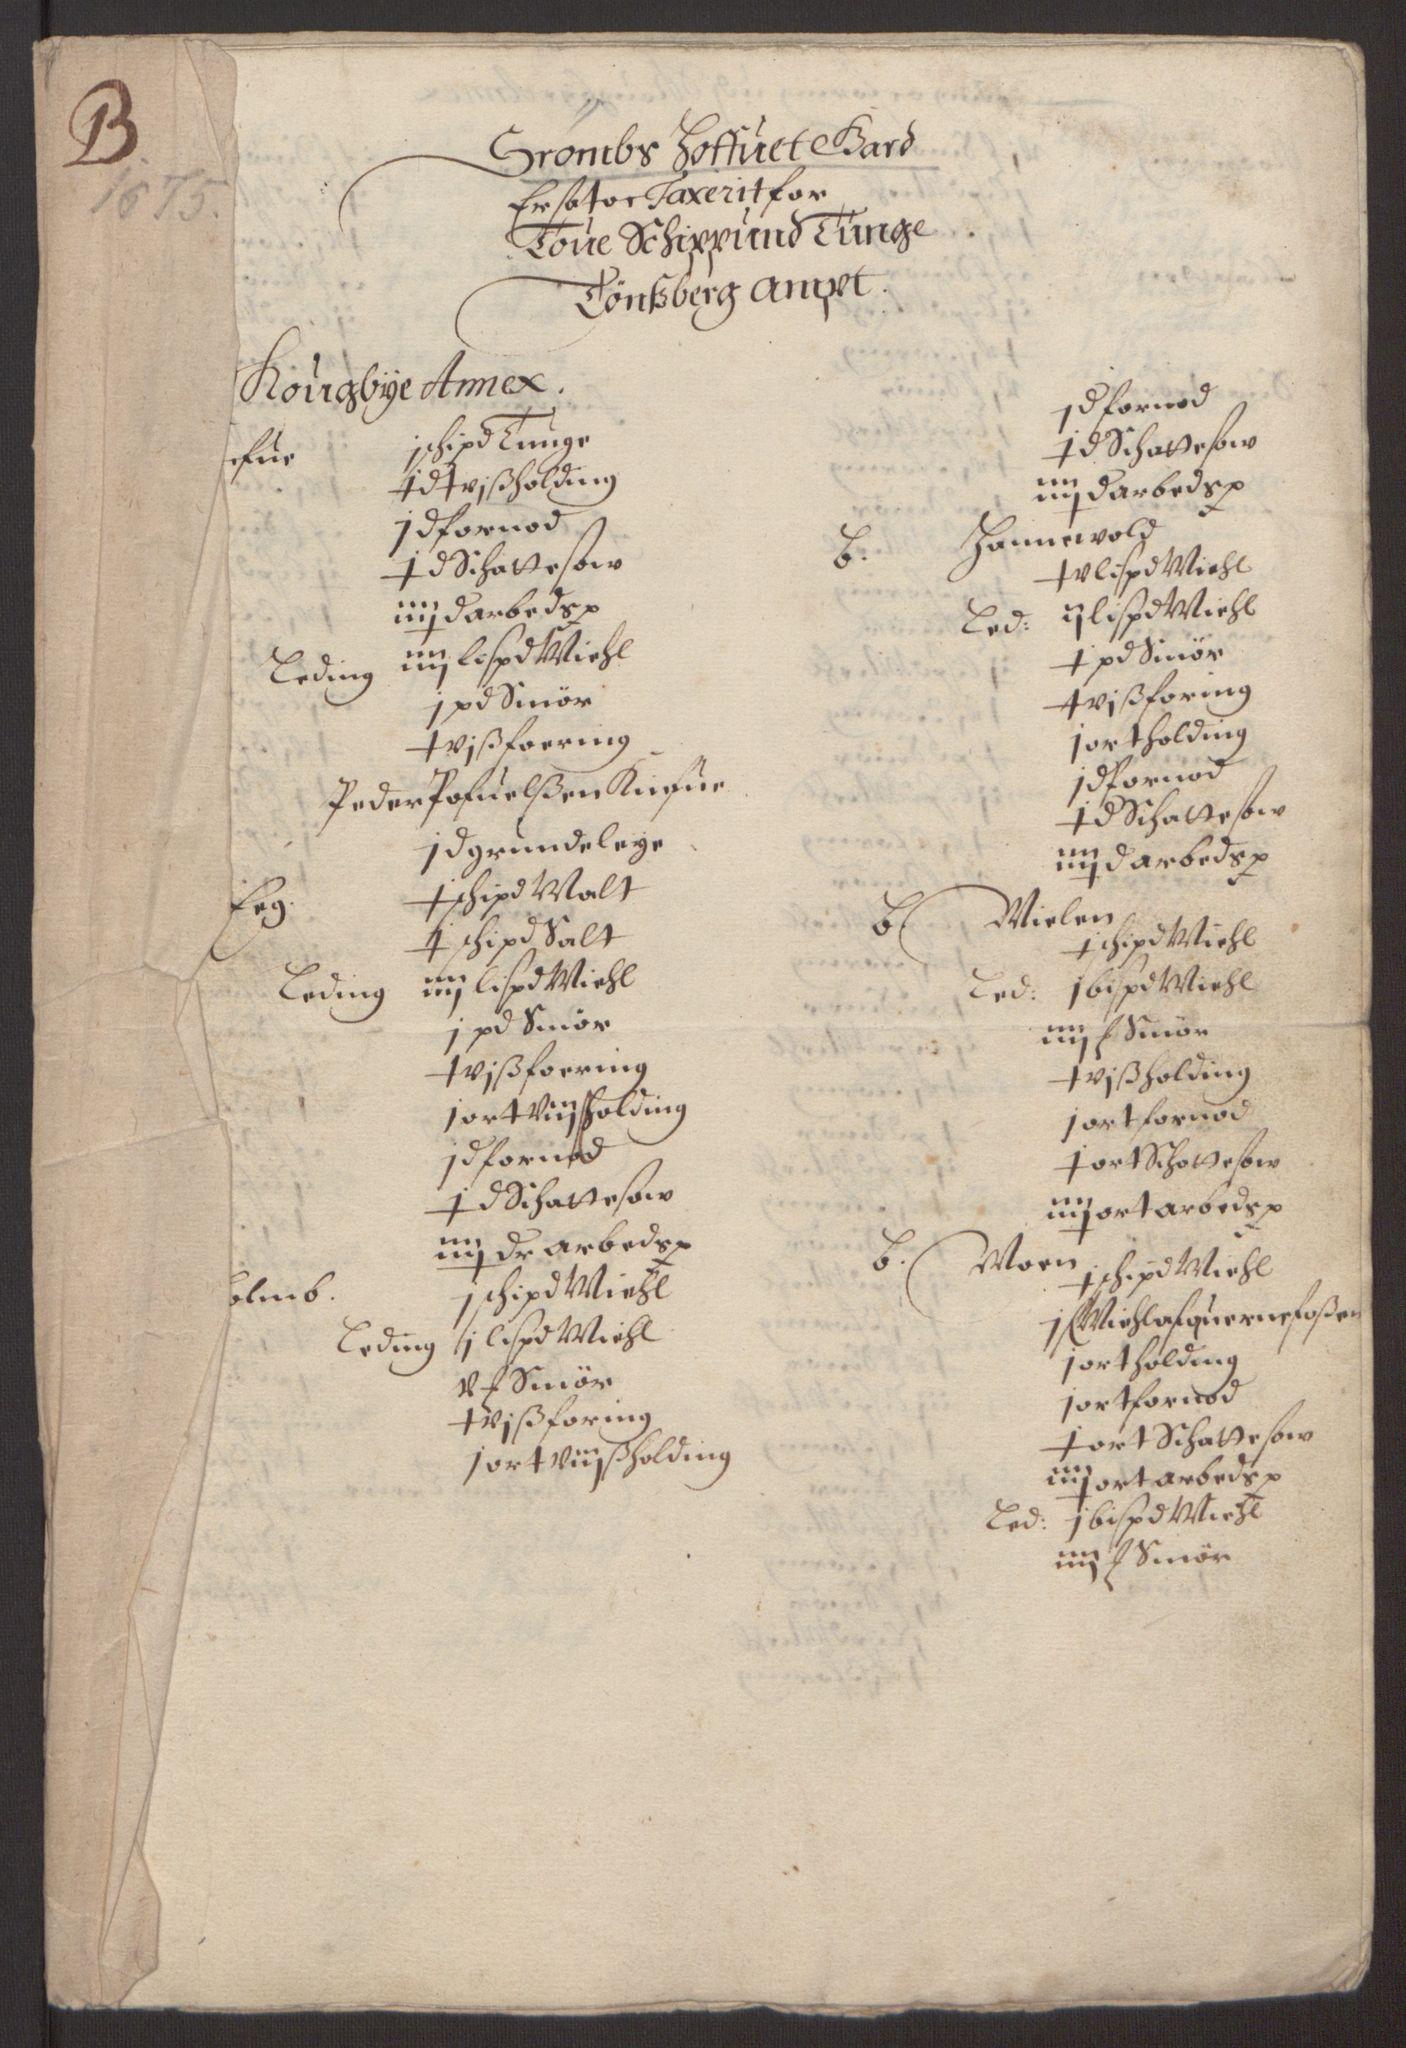 RA, Rentekammeret inntil 1814, Reviderte regnskaper, Fogderegnskap, R32/L1844: Fogderegnskap Jarlsberg grevskap, 1674-1675, s. 405